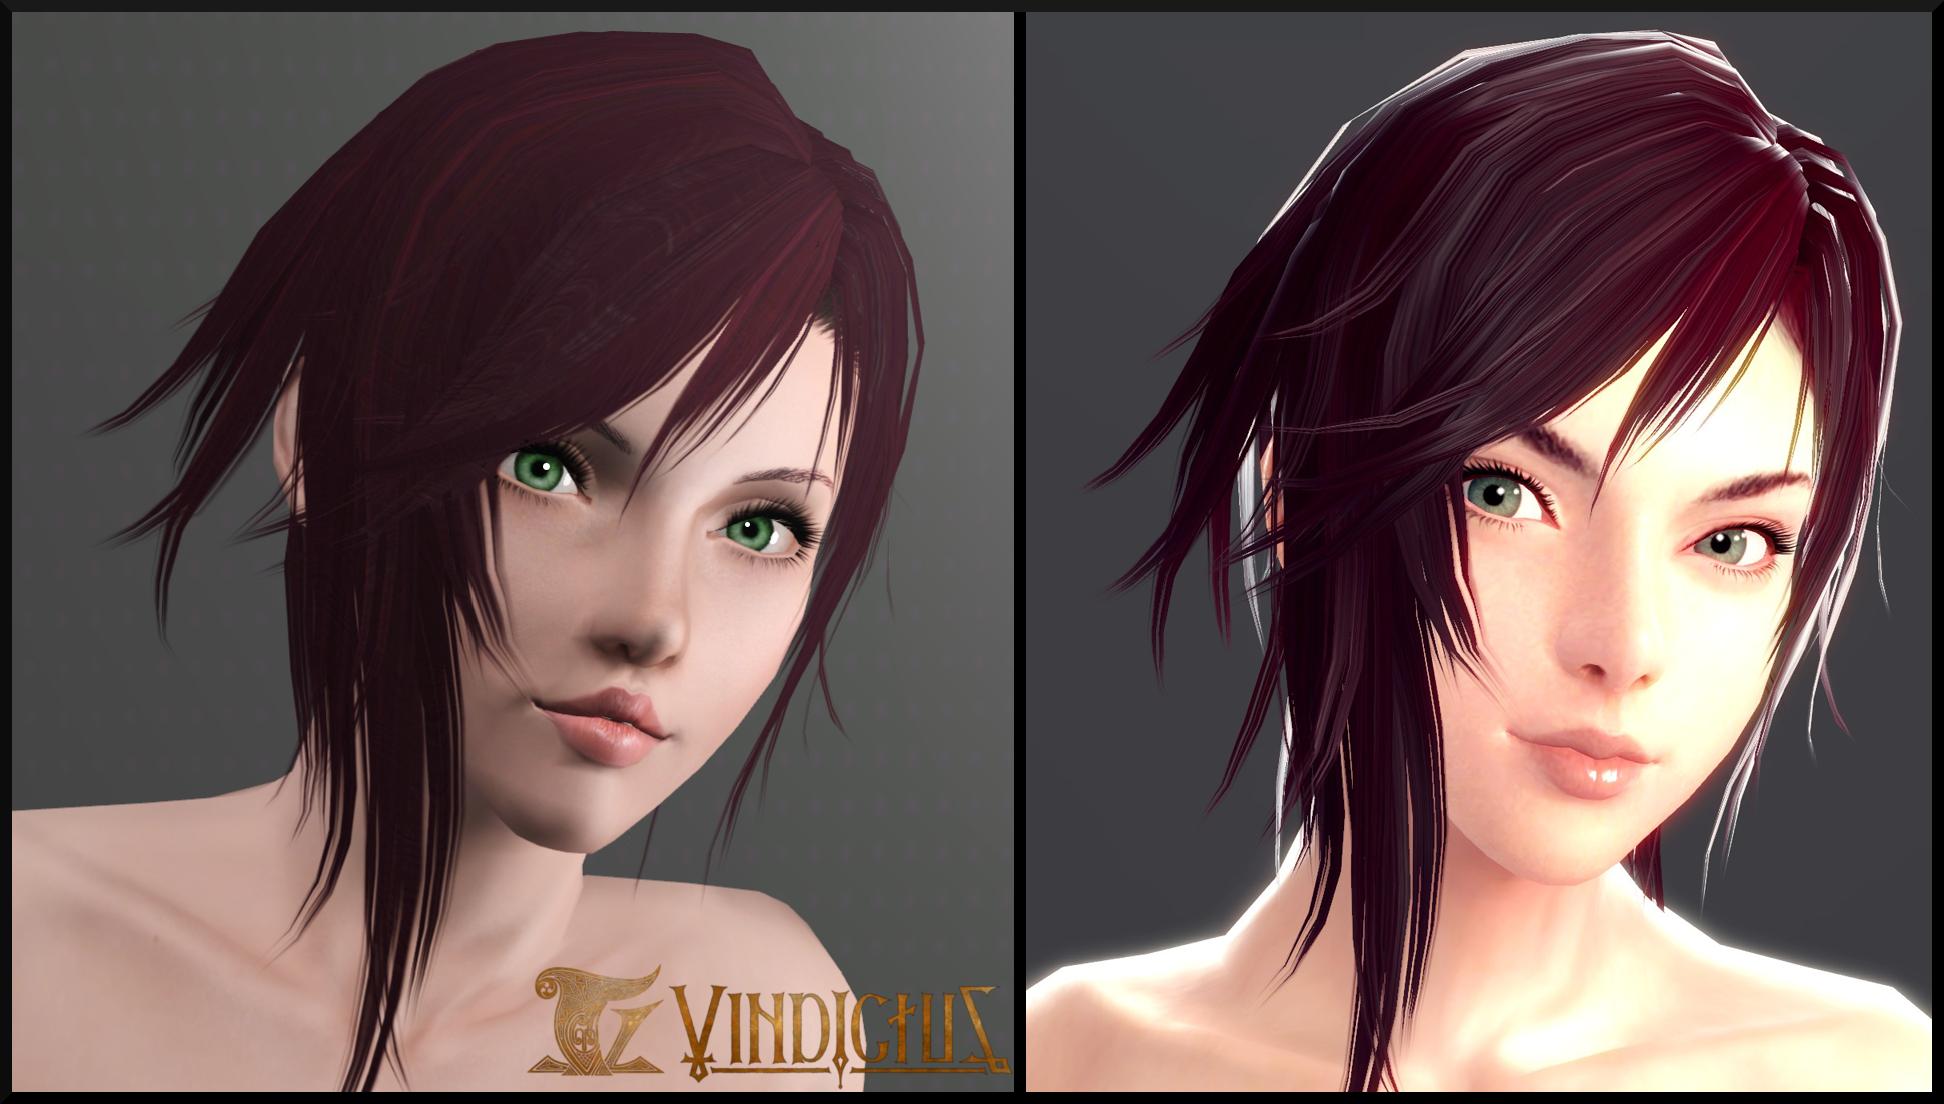 The Sims 3: Vindictus - Vella by Tx-Slade-xT on DeviantArt